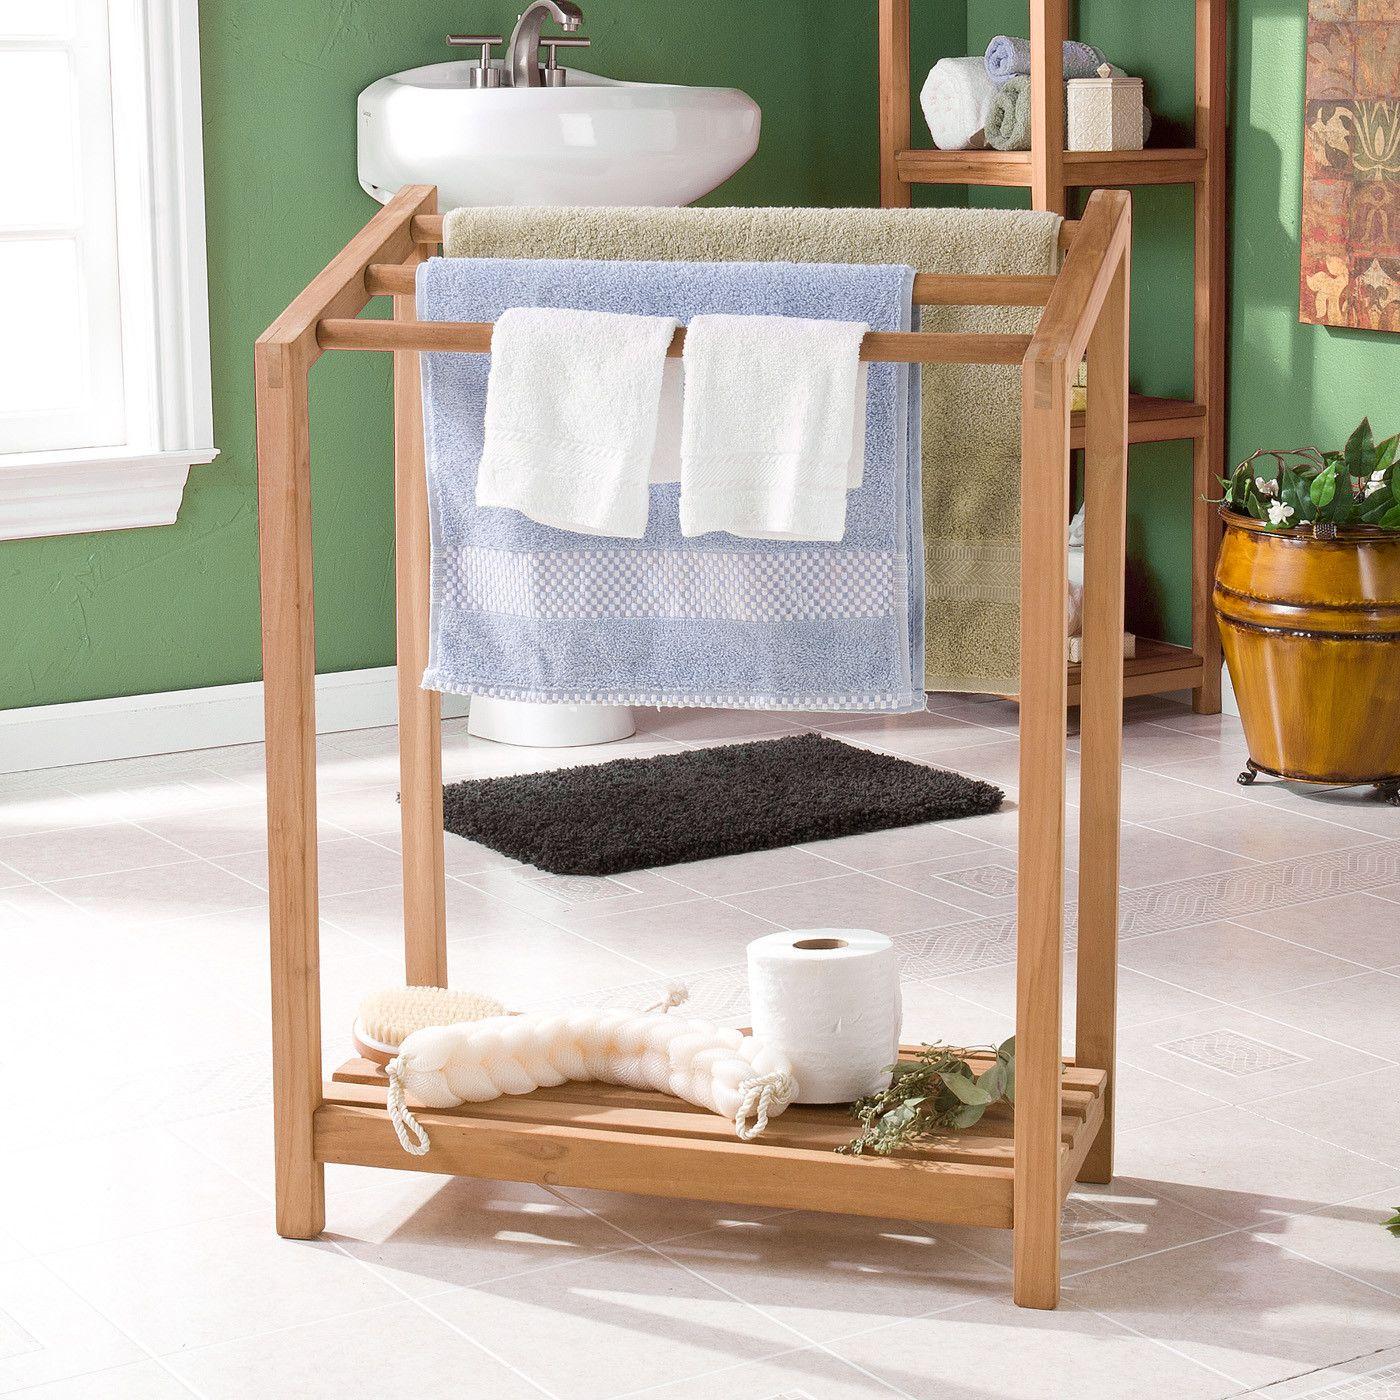 Freestanding Towel Rack Rak Handuk Rak Handuk